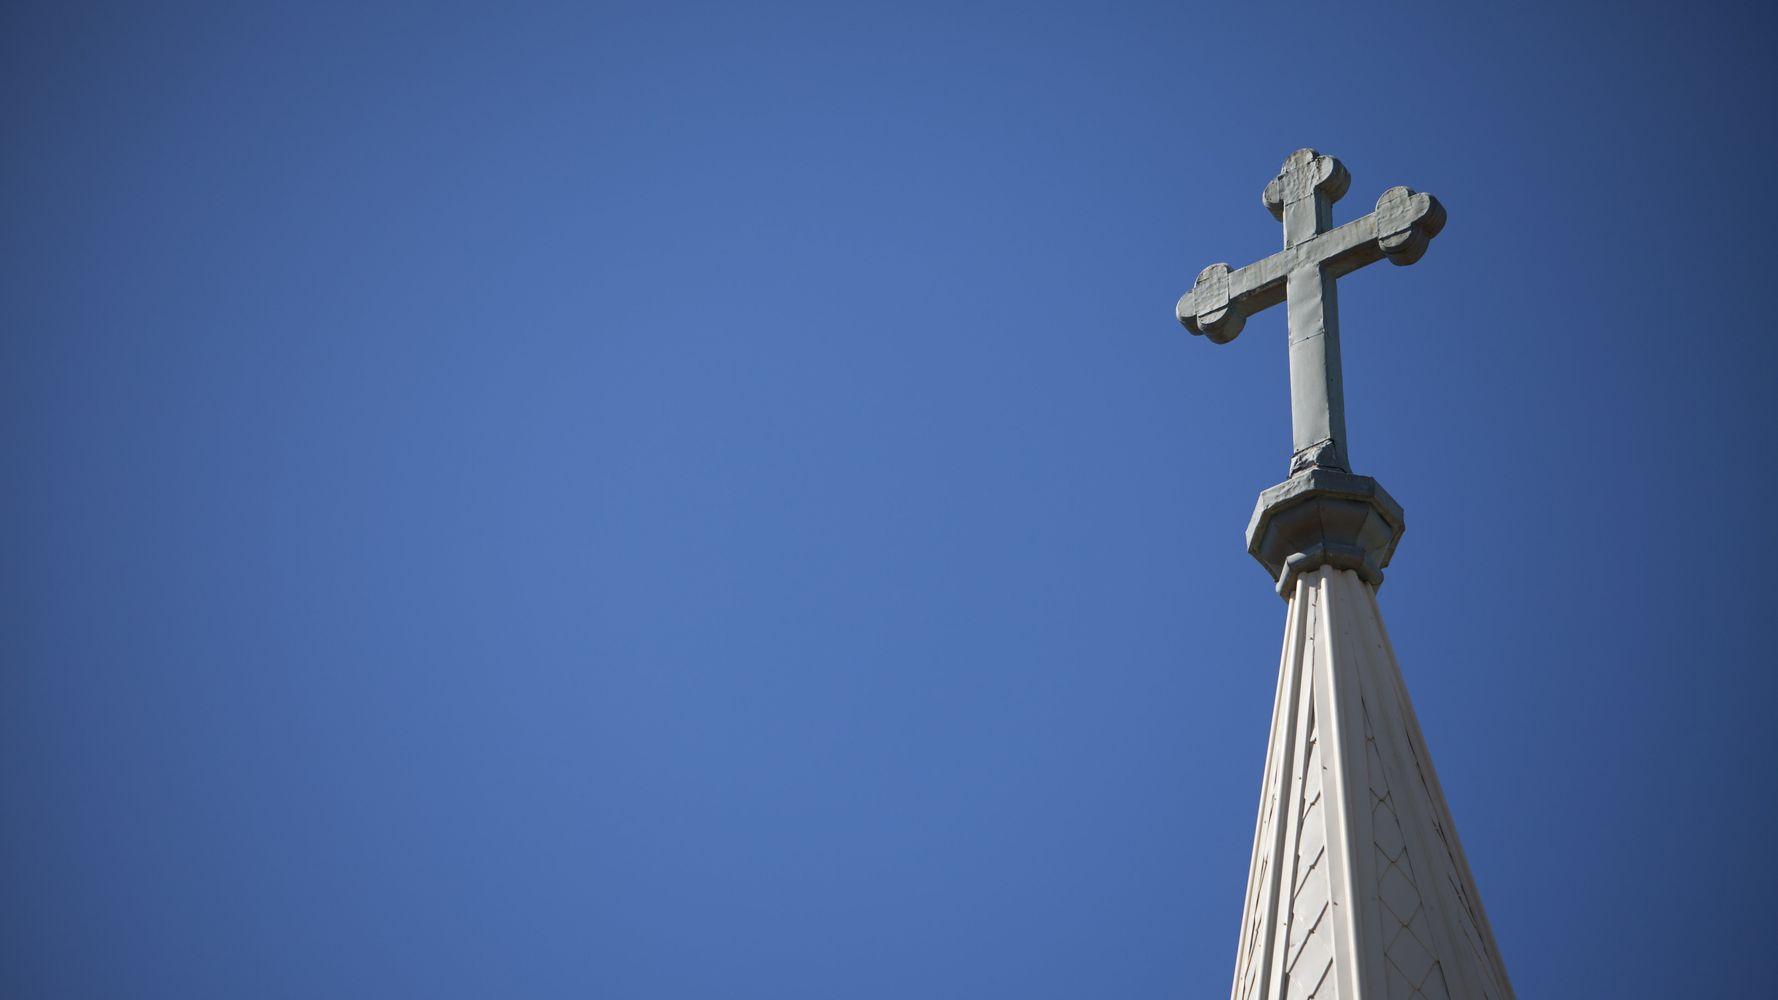 I'm A Lifelong Catholic  Here's Why I've Finally Decided To Leave